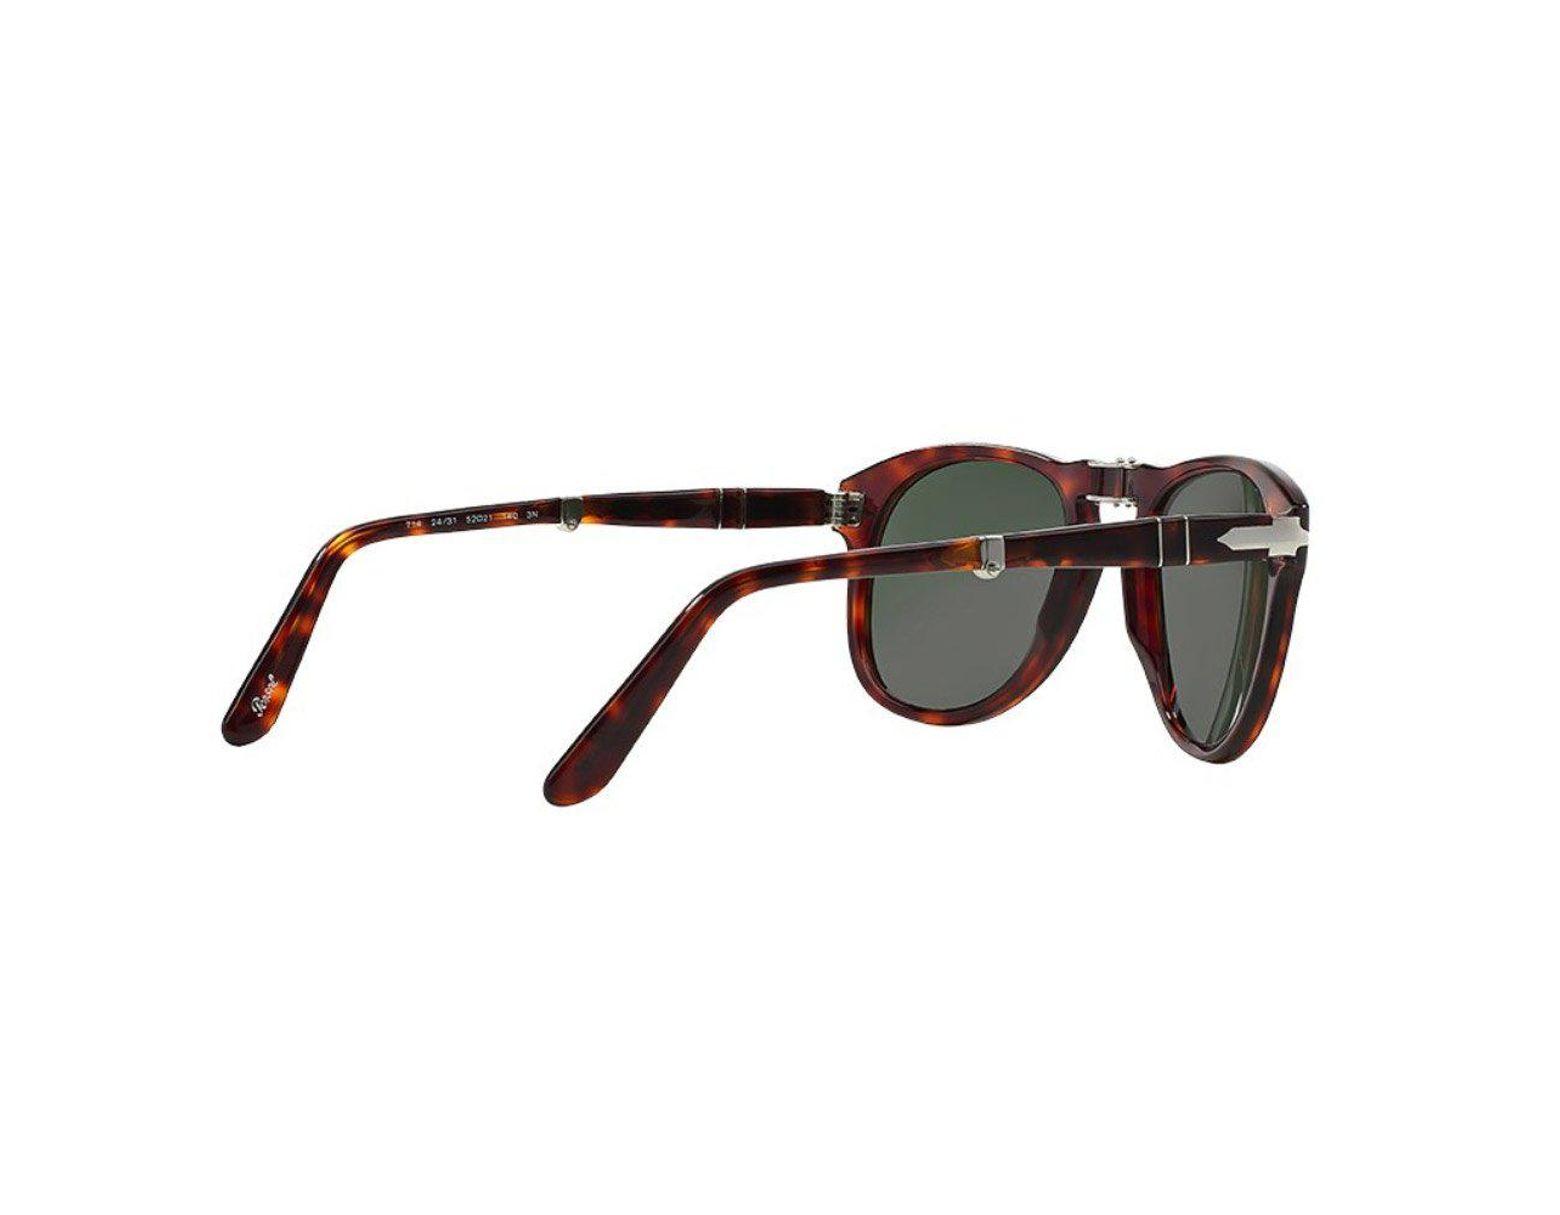 2ef60f4950bd Persol 714 Havana Tortoise Foldable Sunglasses 0po0714 24/ in Black for Men  - Lyst